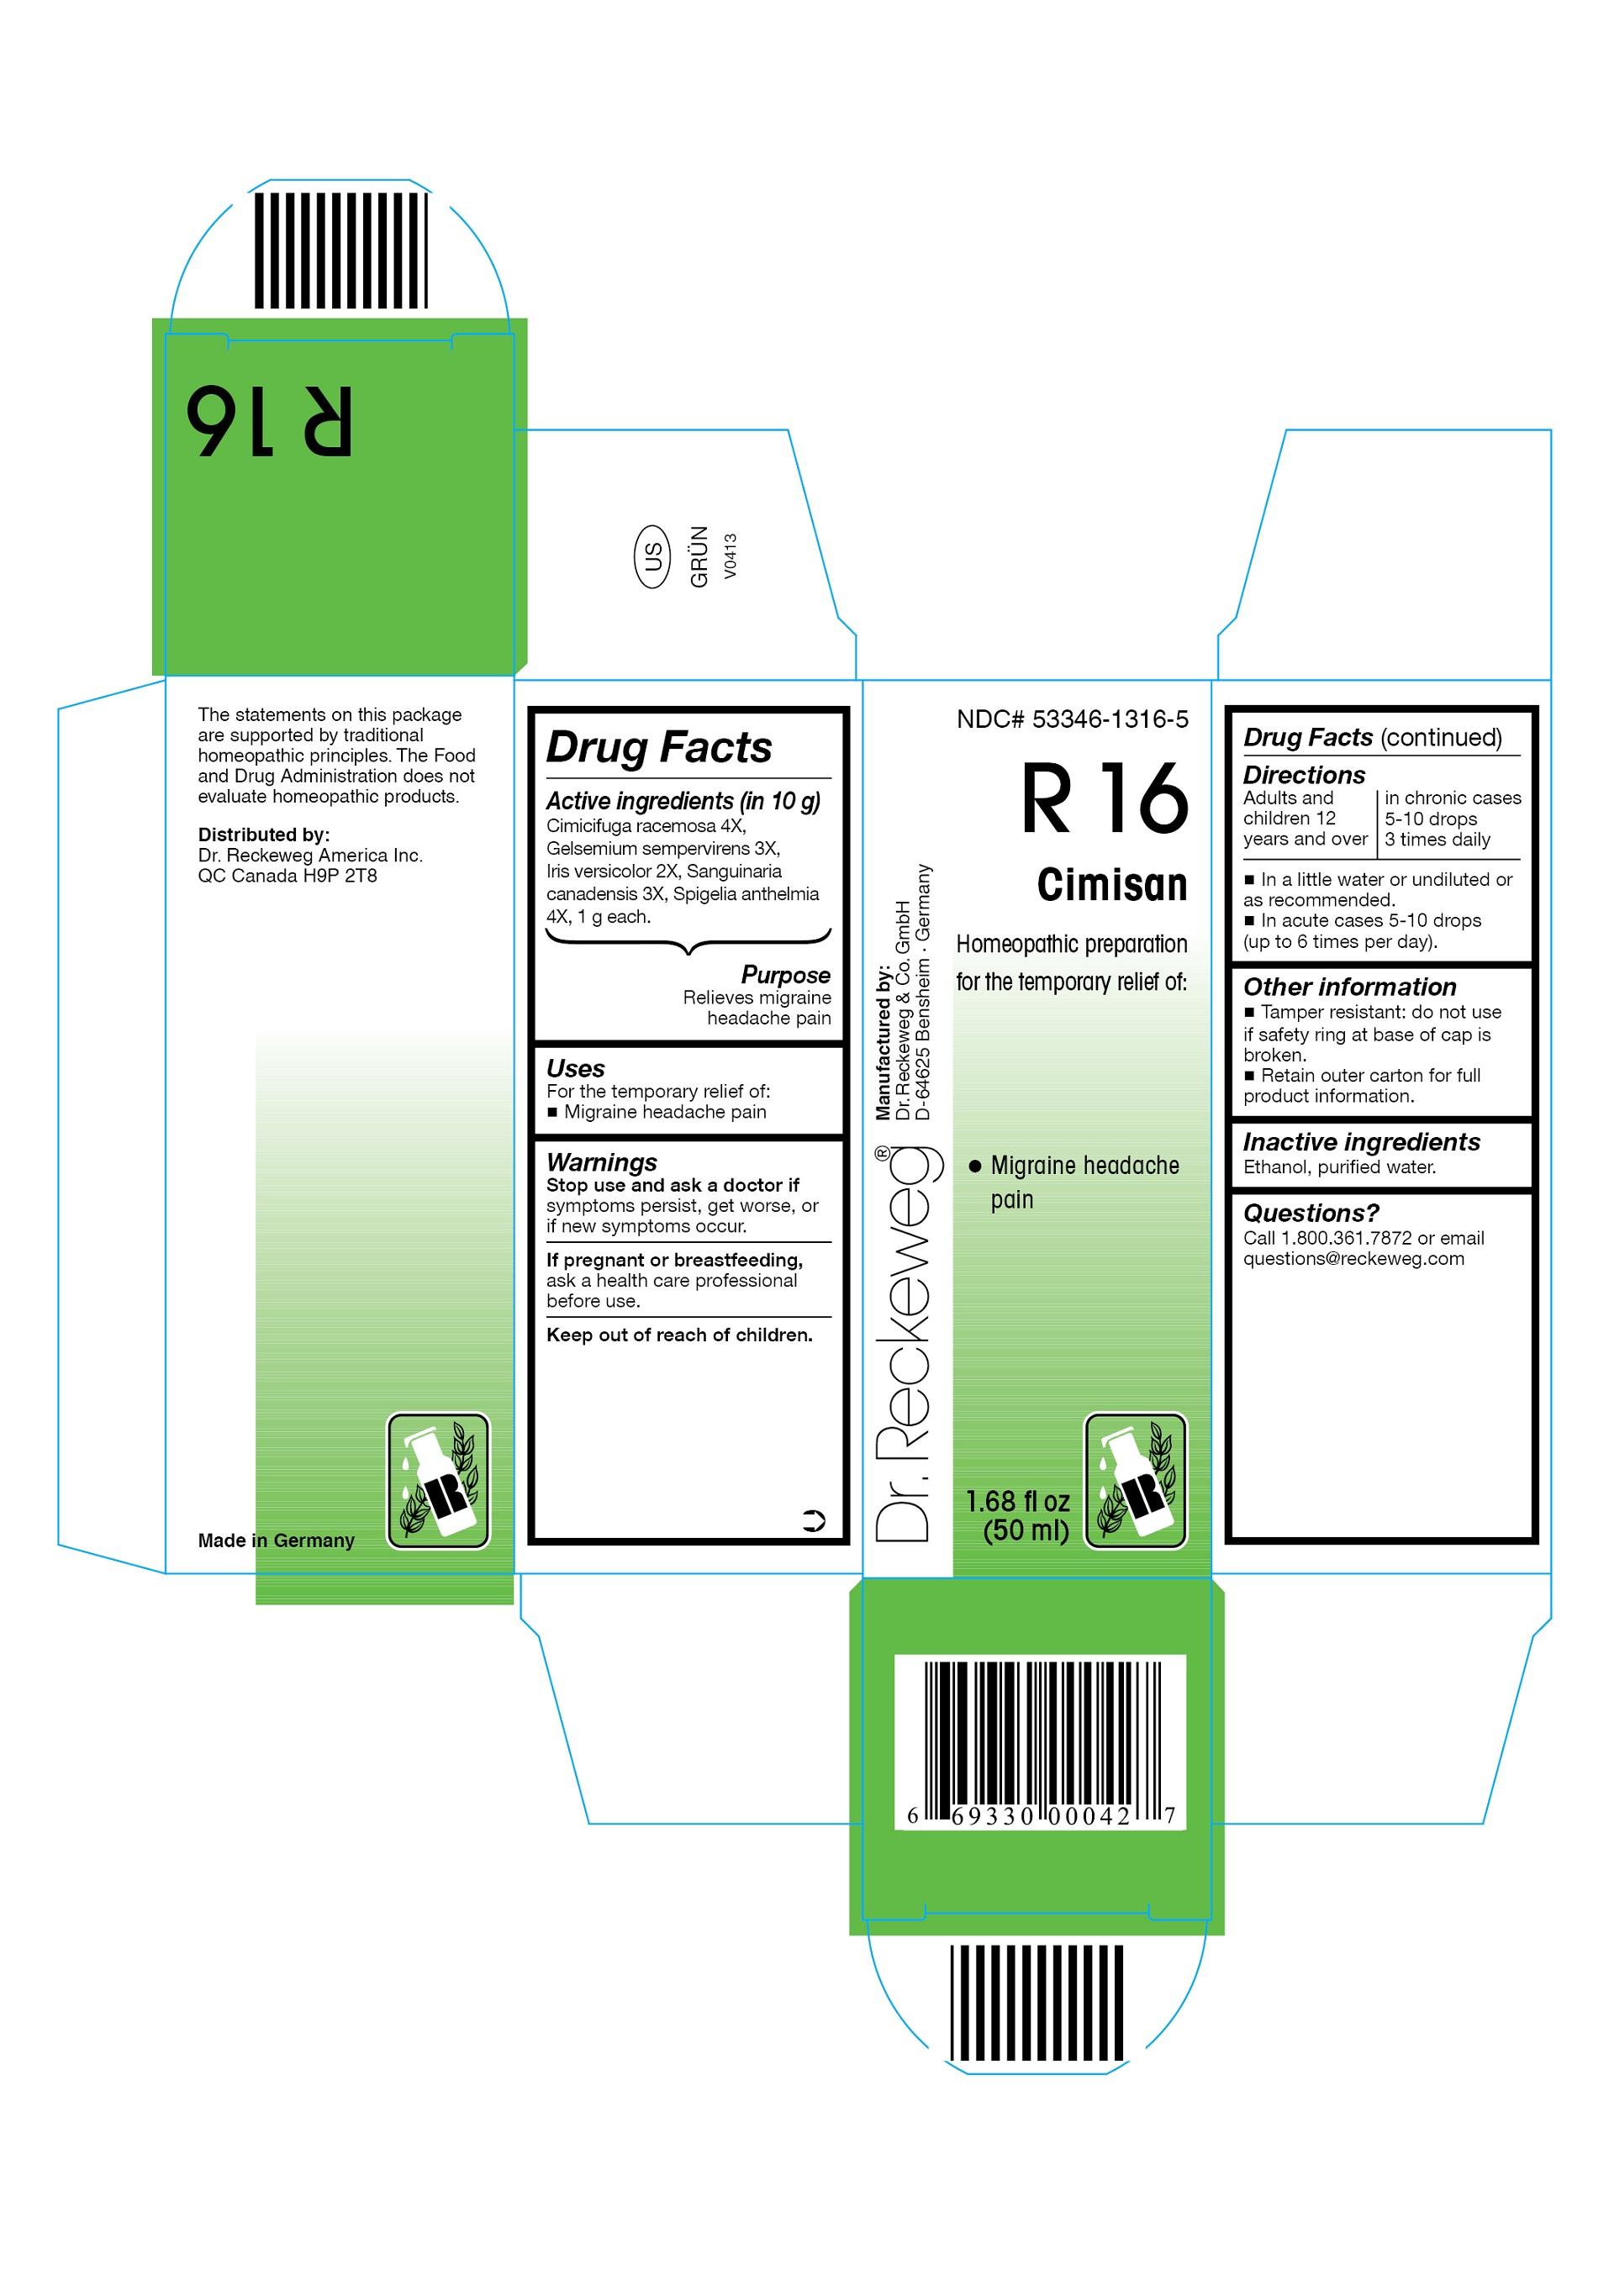 Dr. Reckeweg R16 Cimisan Combination Product (Cimicifuga Racemosa 4x, Gelsemium Sempervirens 3x, Iris Versicolor 2x, Sanguinaria Canadensis 3x, Spigelia Anthelmia 4x) Liquid [Pharmazeutische Fabrik Dr. Reckeweg & Co]